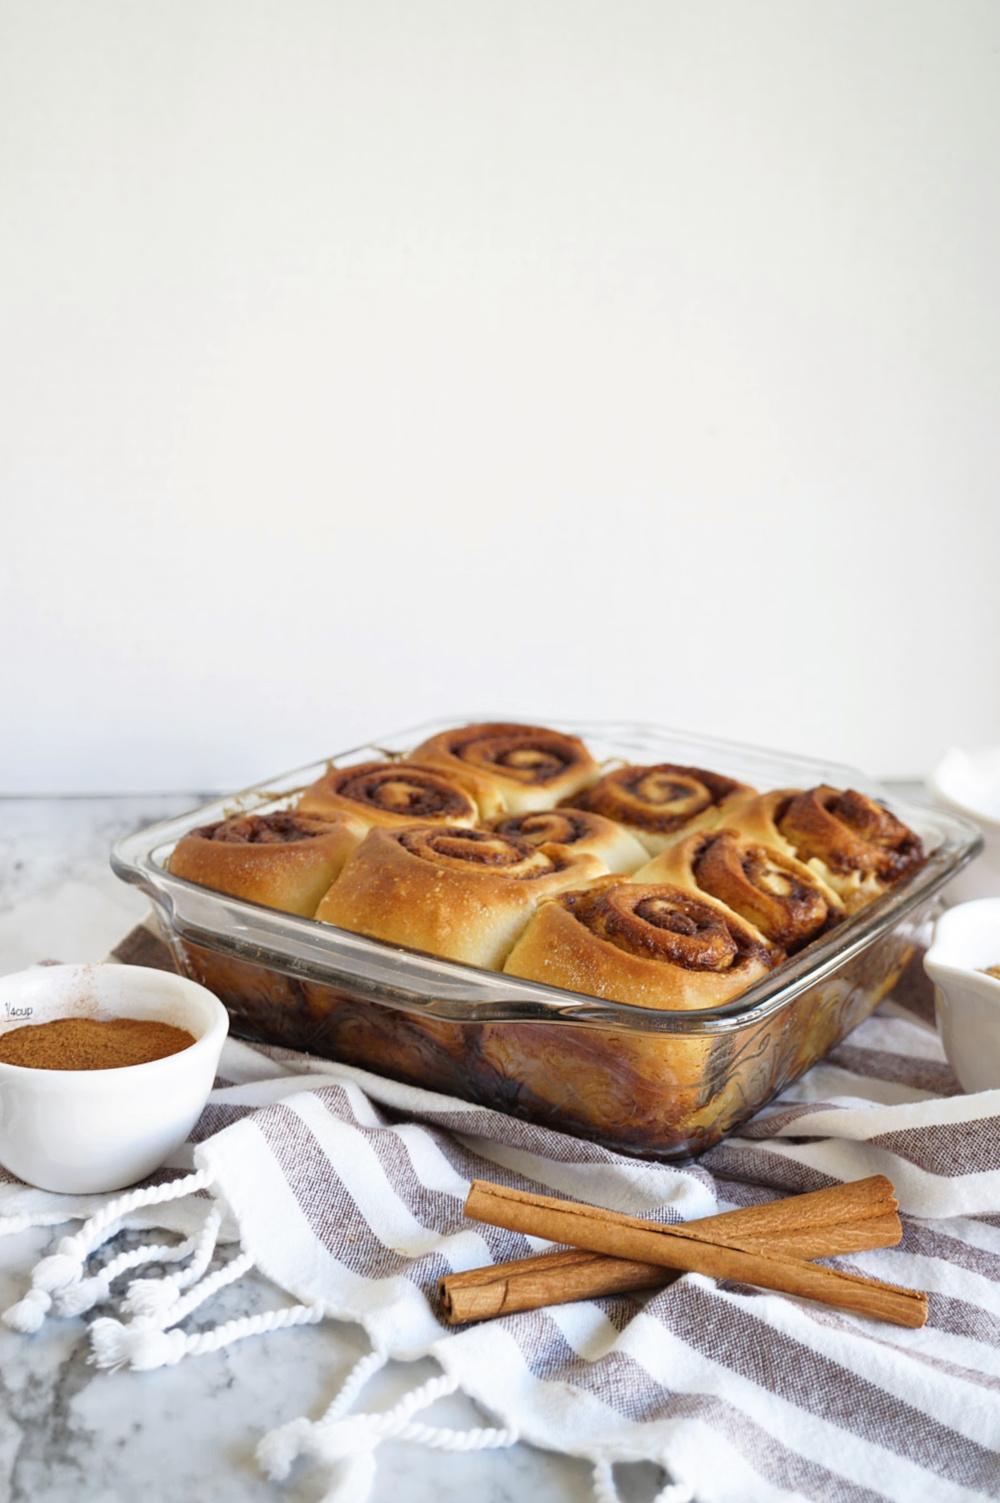 pan of plain cinnamon rolls